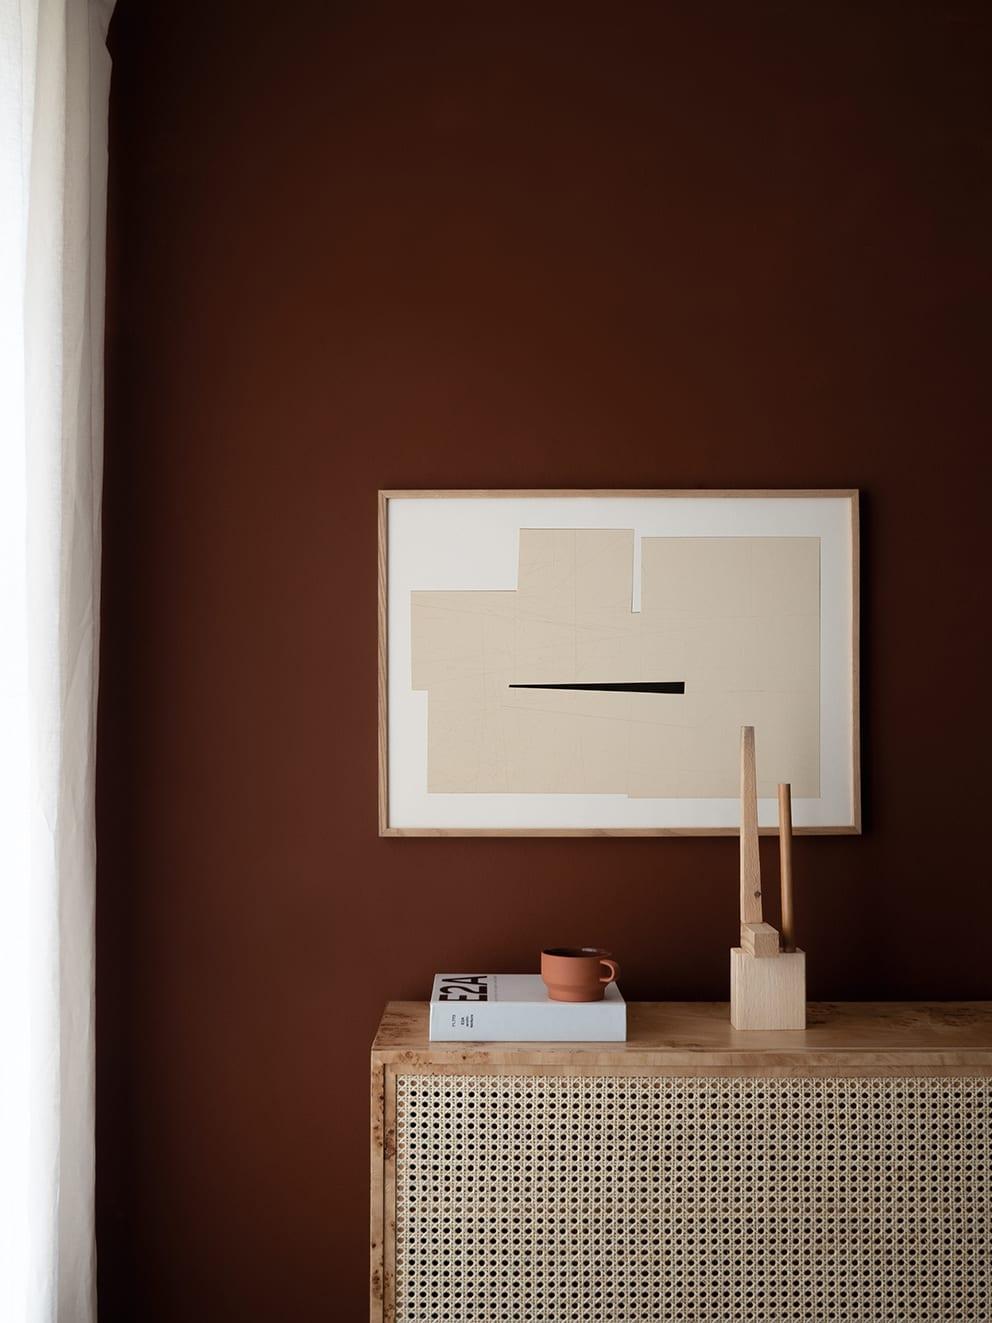 Atelier CPH - Deconstructed No. 32